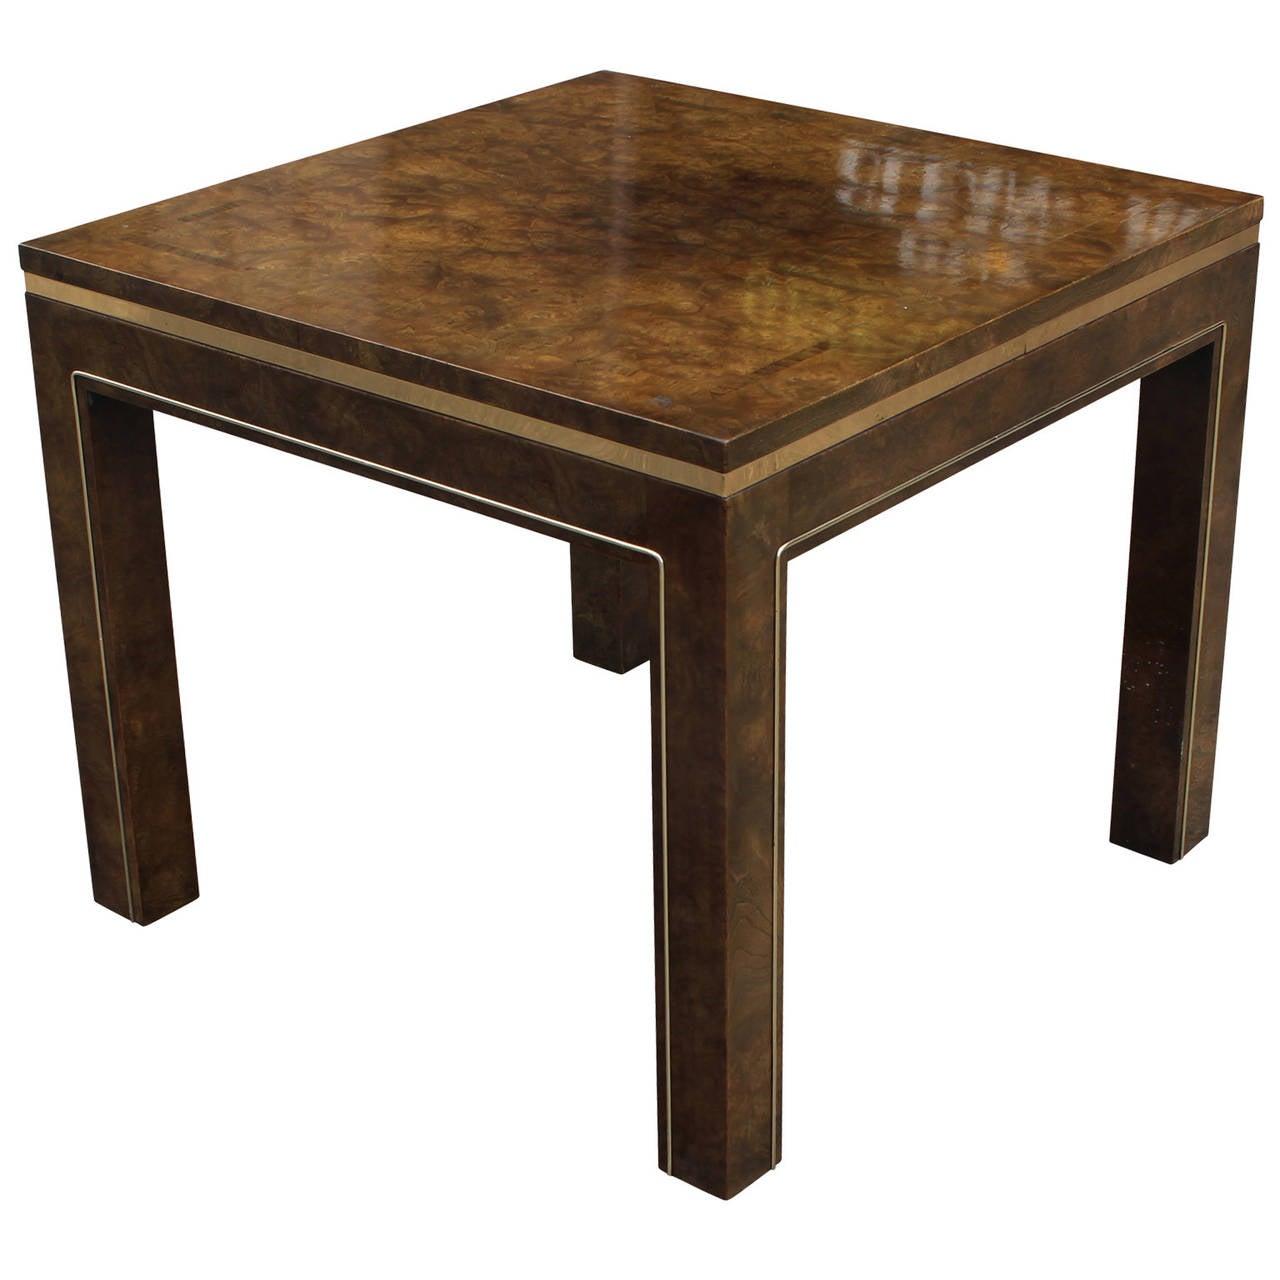 Hollywood Regency Mastercraft Burl and Brass Side Table